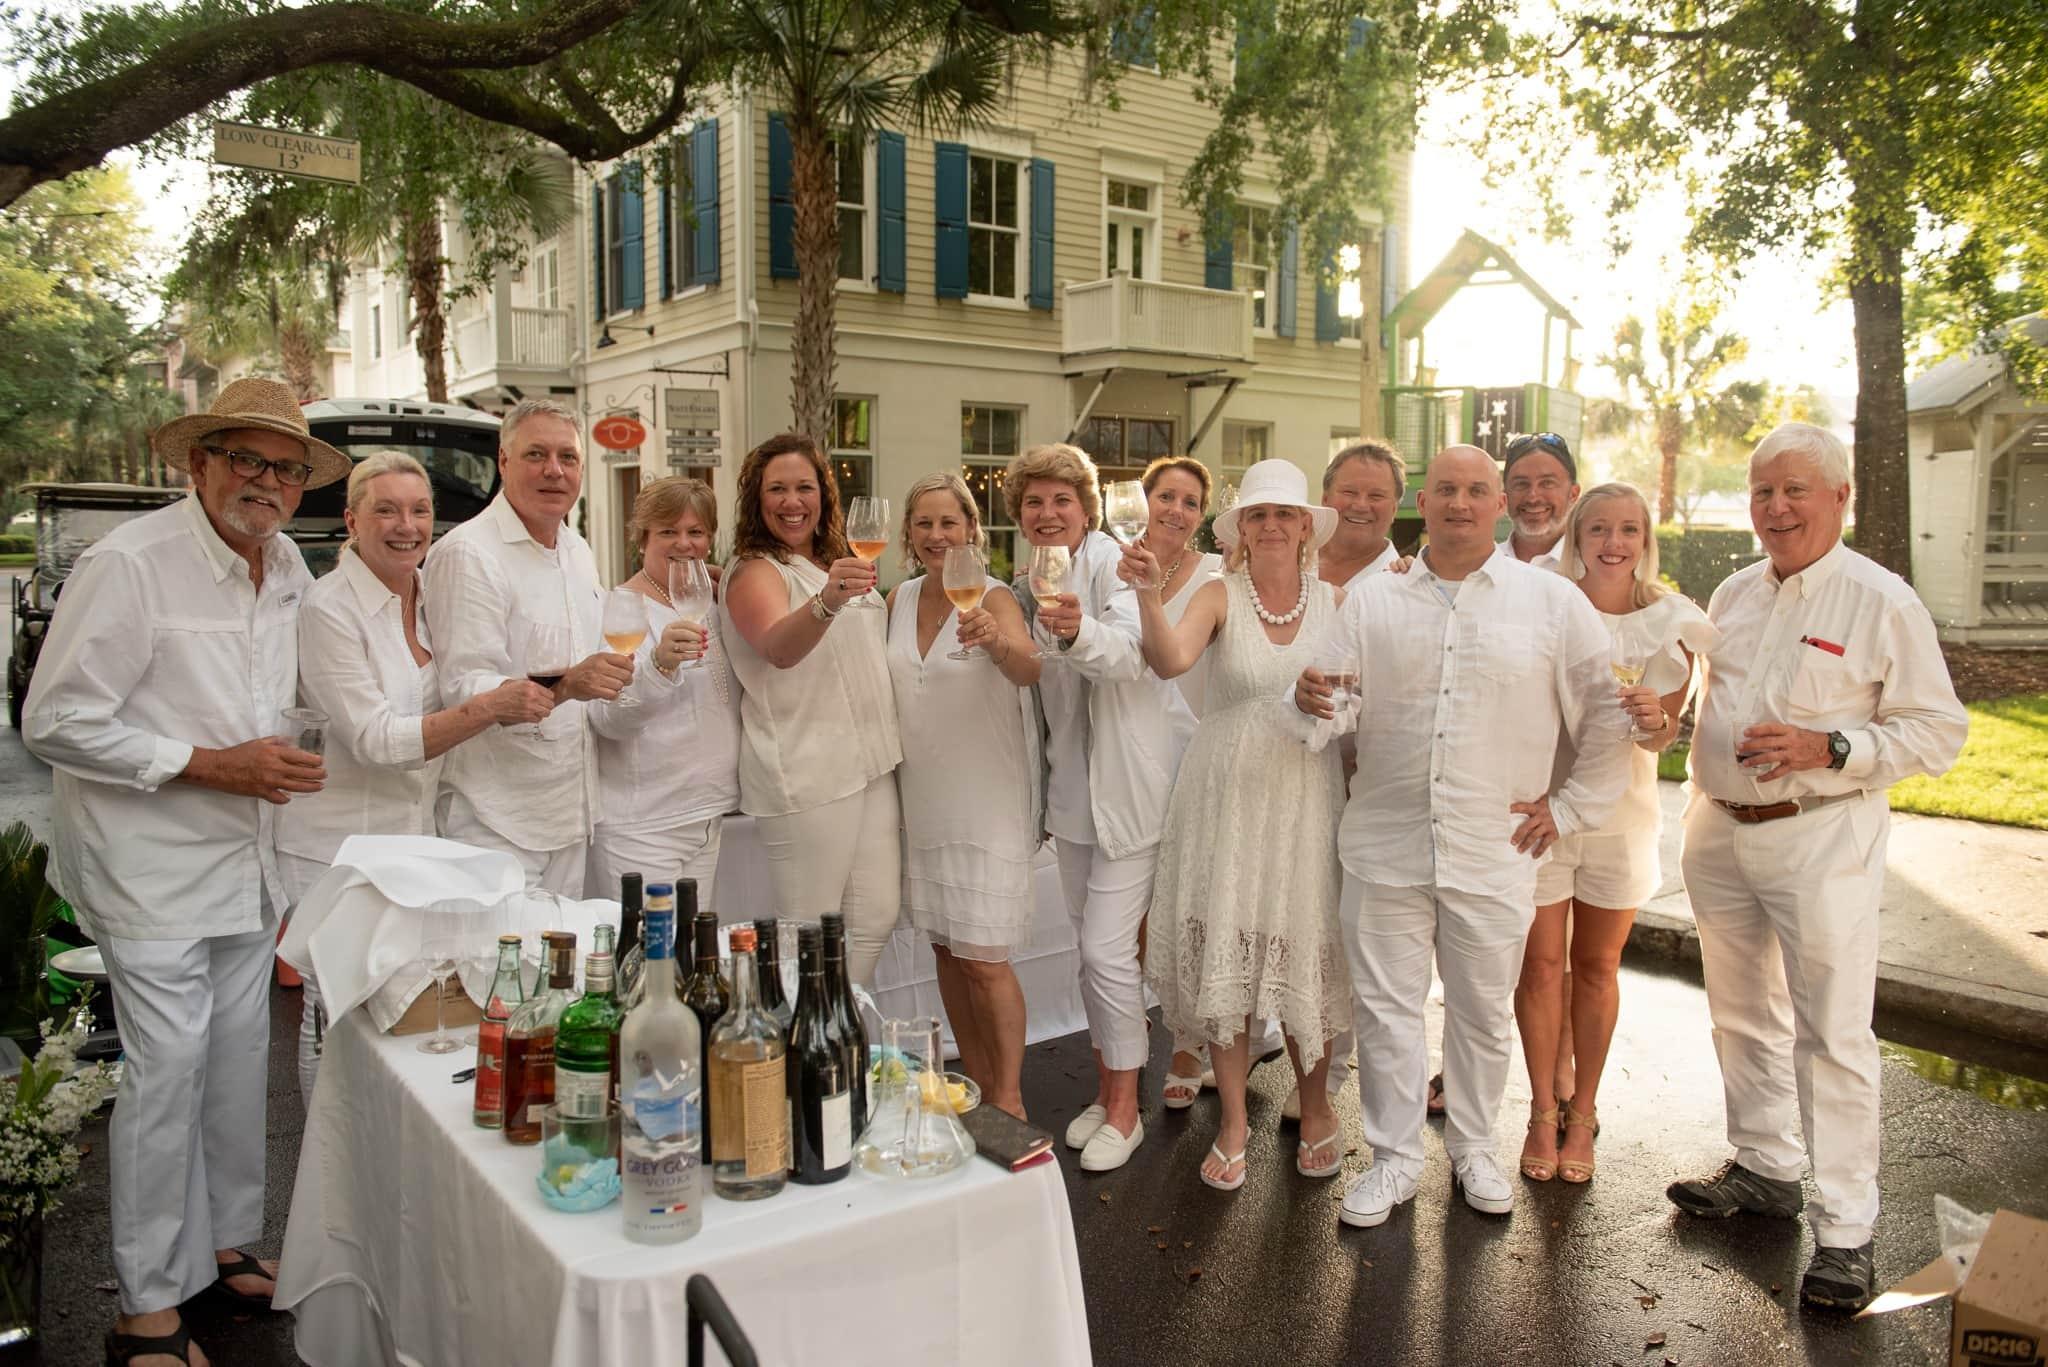 Habersham Supper Club